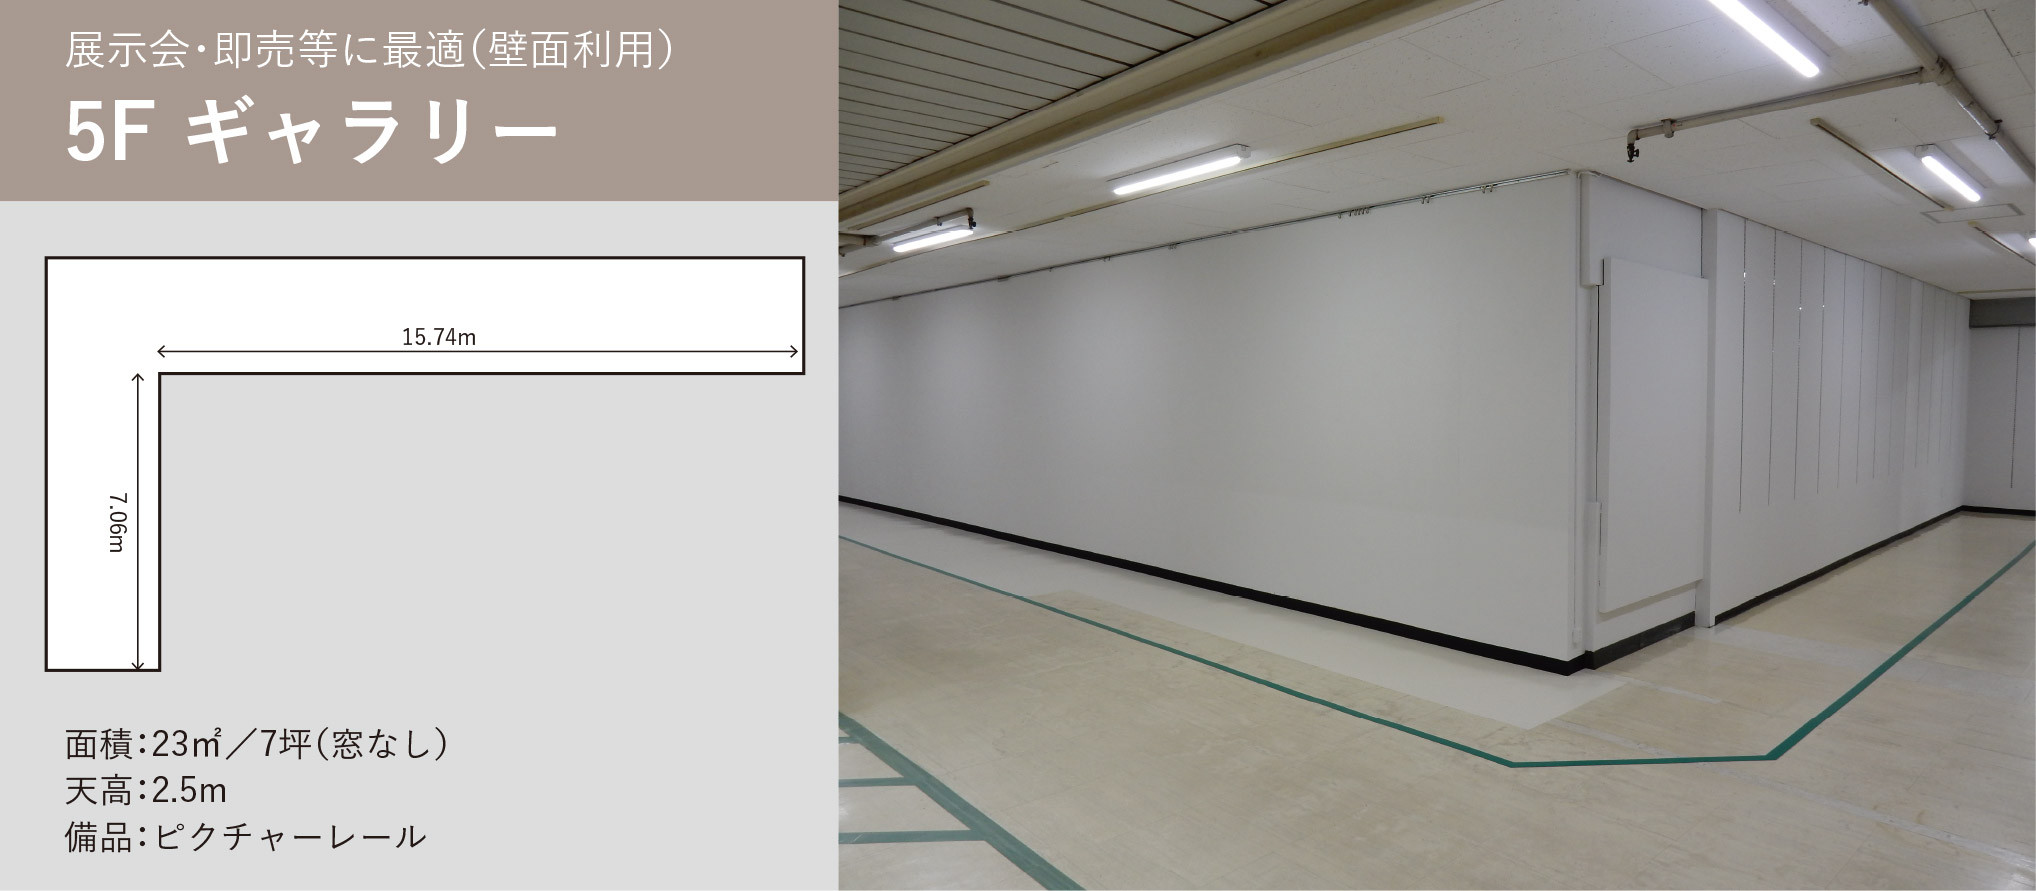 Hall_5F_Gallery.jpg